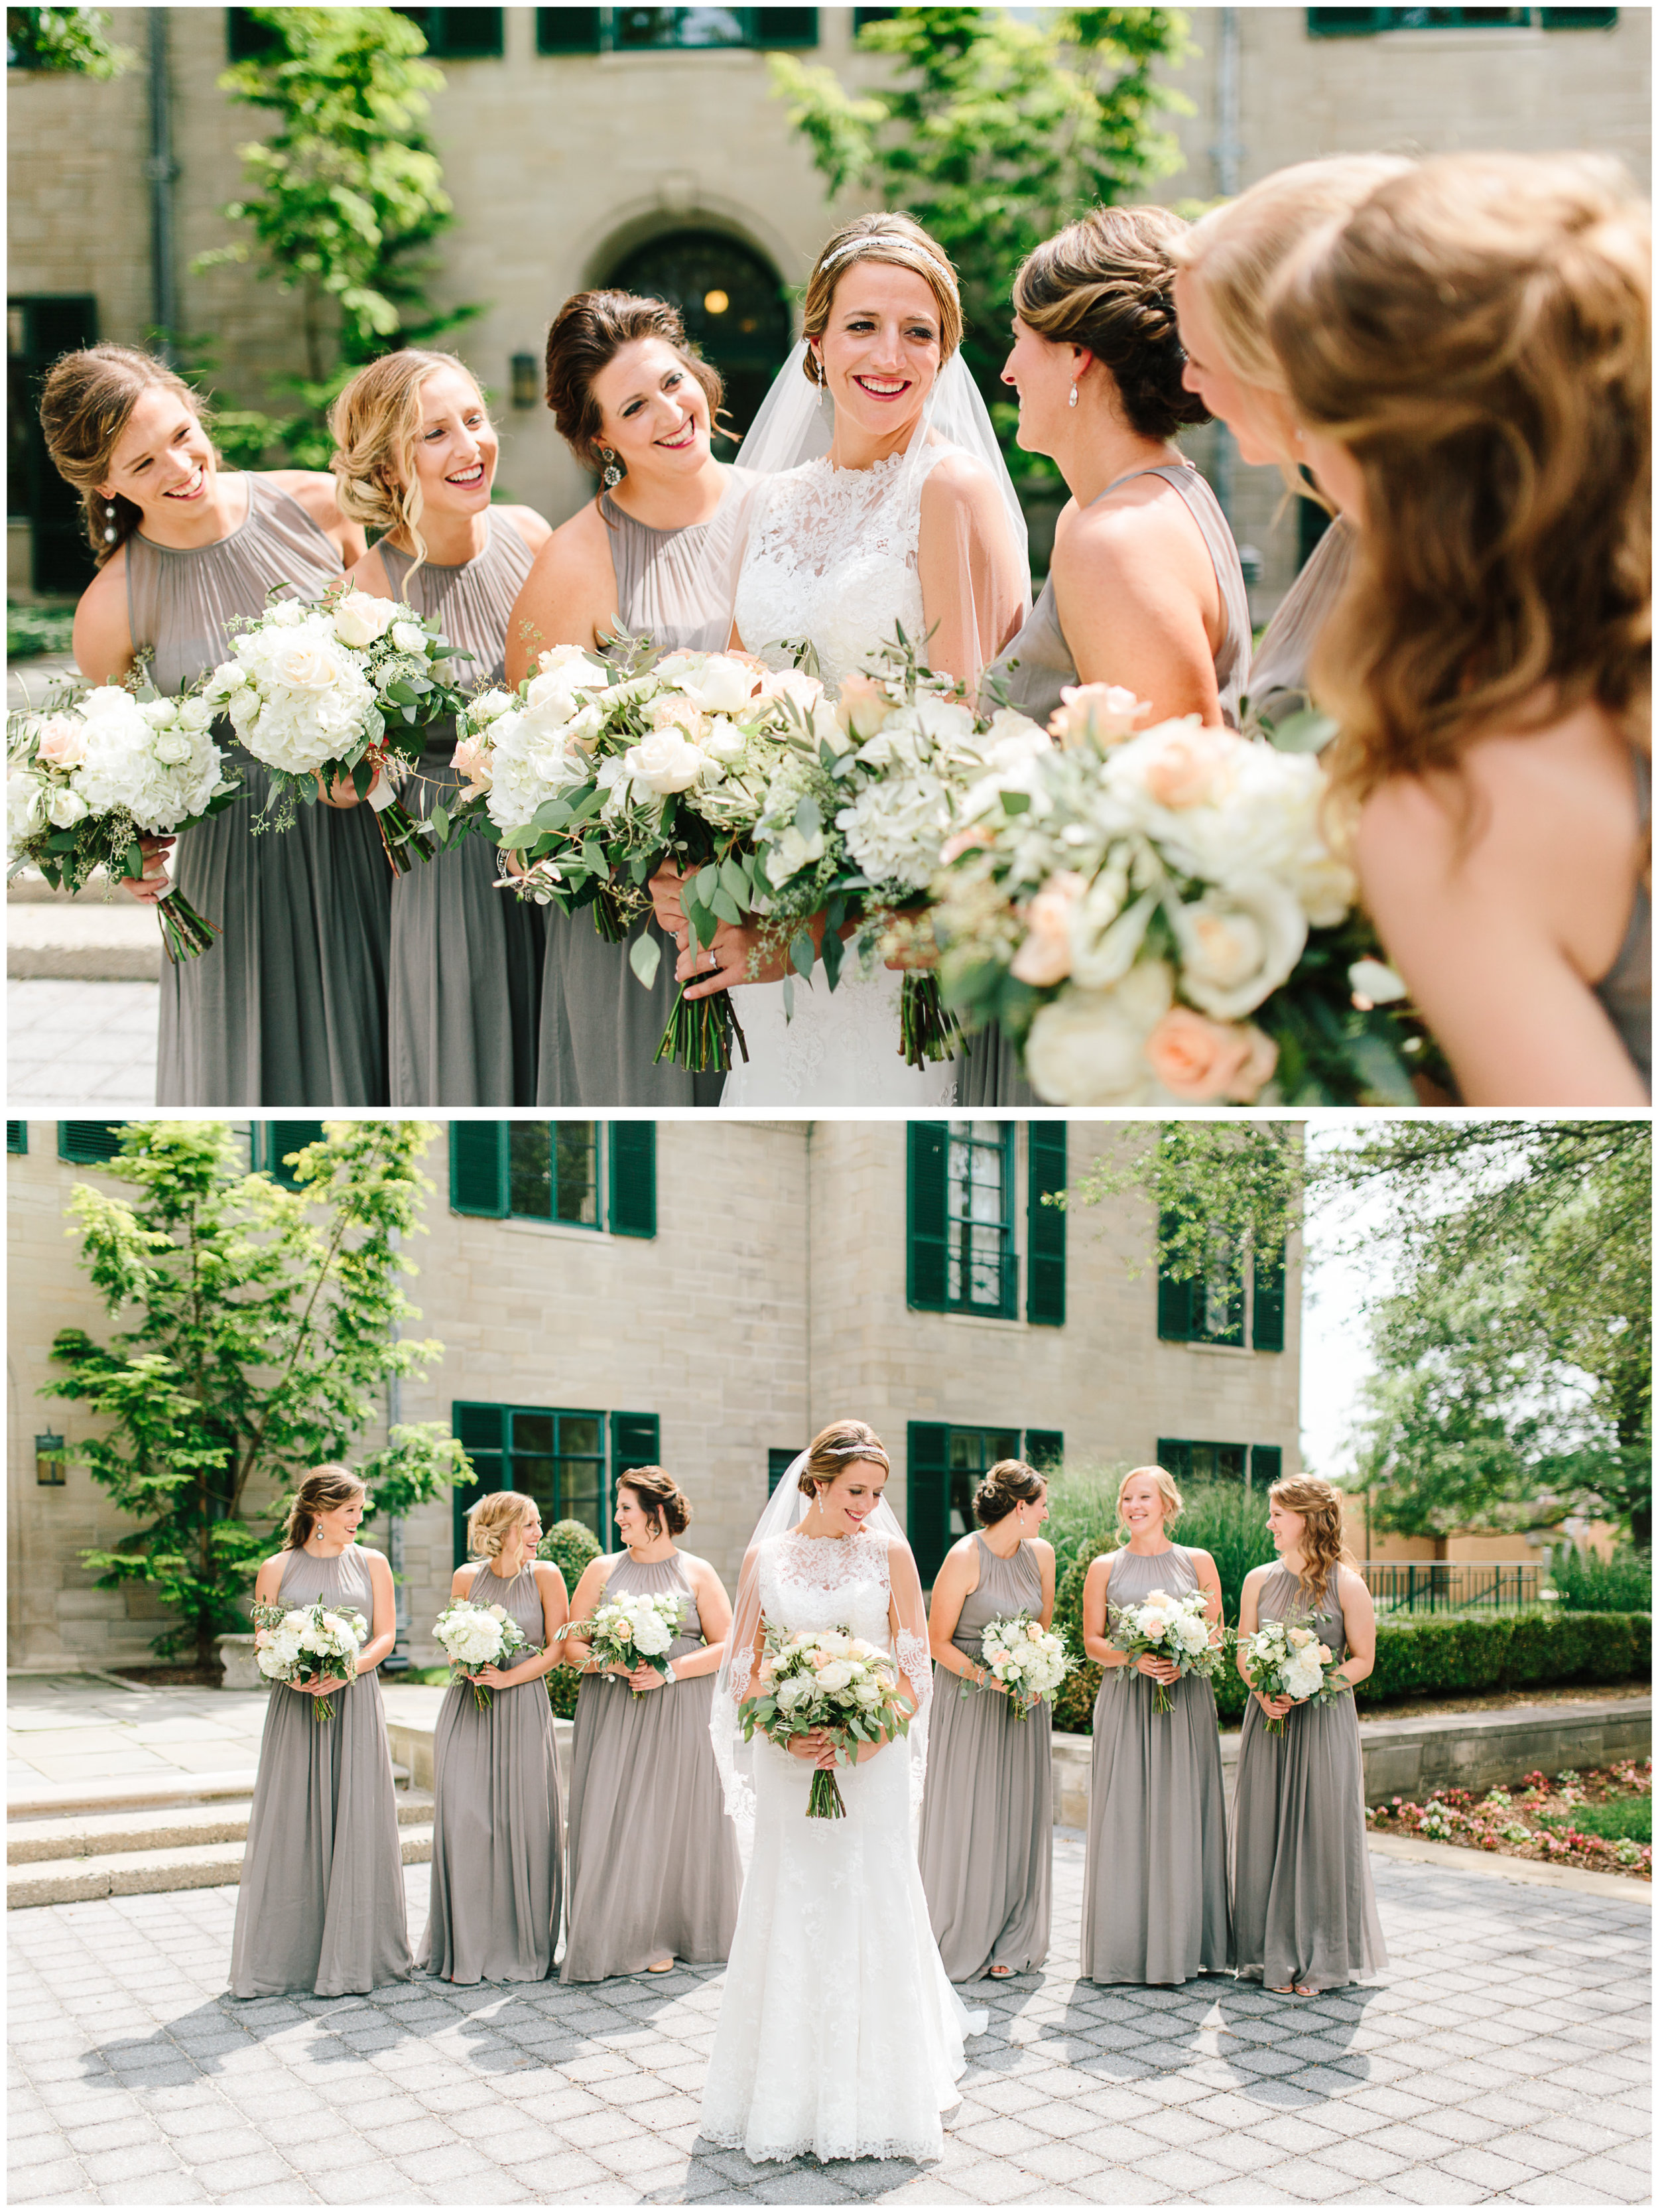 ann_arbor_michigan_wedding_51.jpg